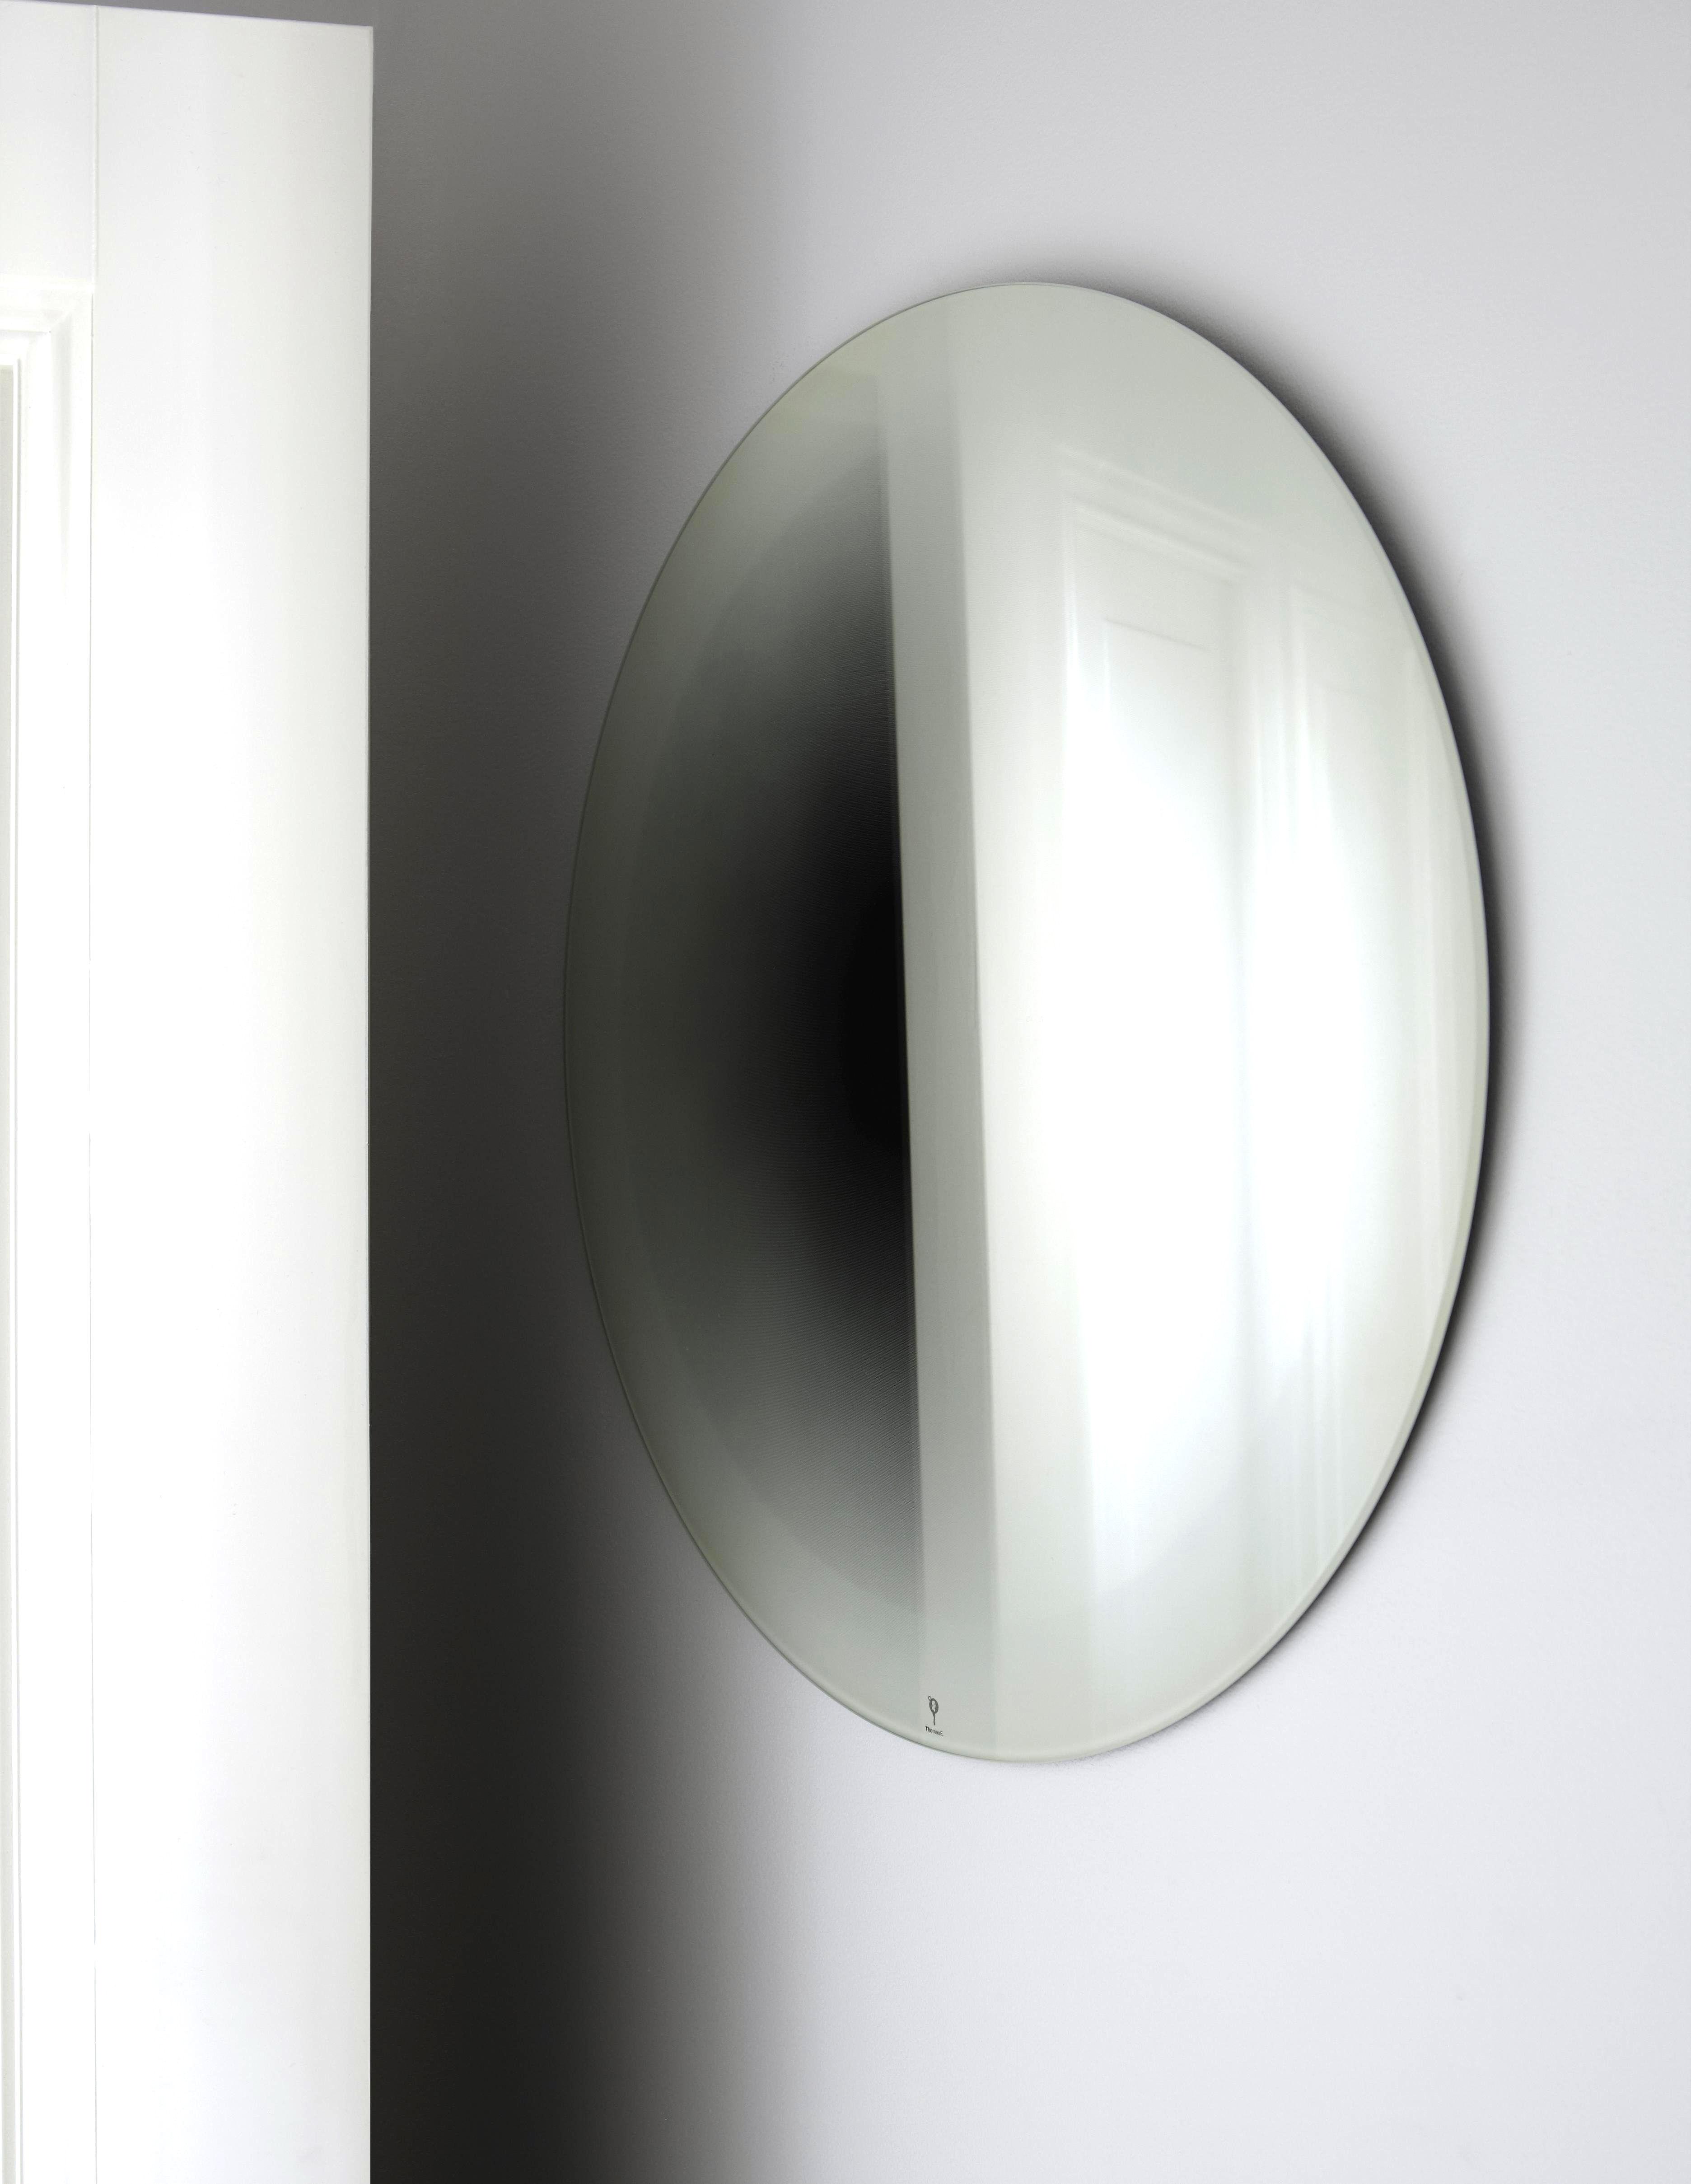 Möbel - Spiegel - Fading Small Wandspiegel Ø 55 cm - ENOstudio - Weiß - Glas, Silber